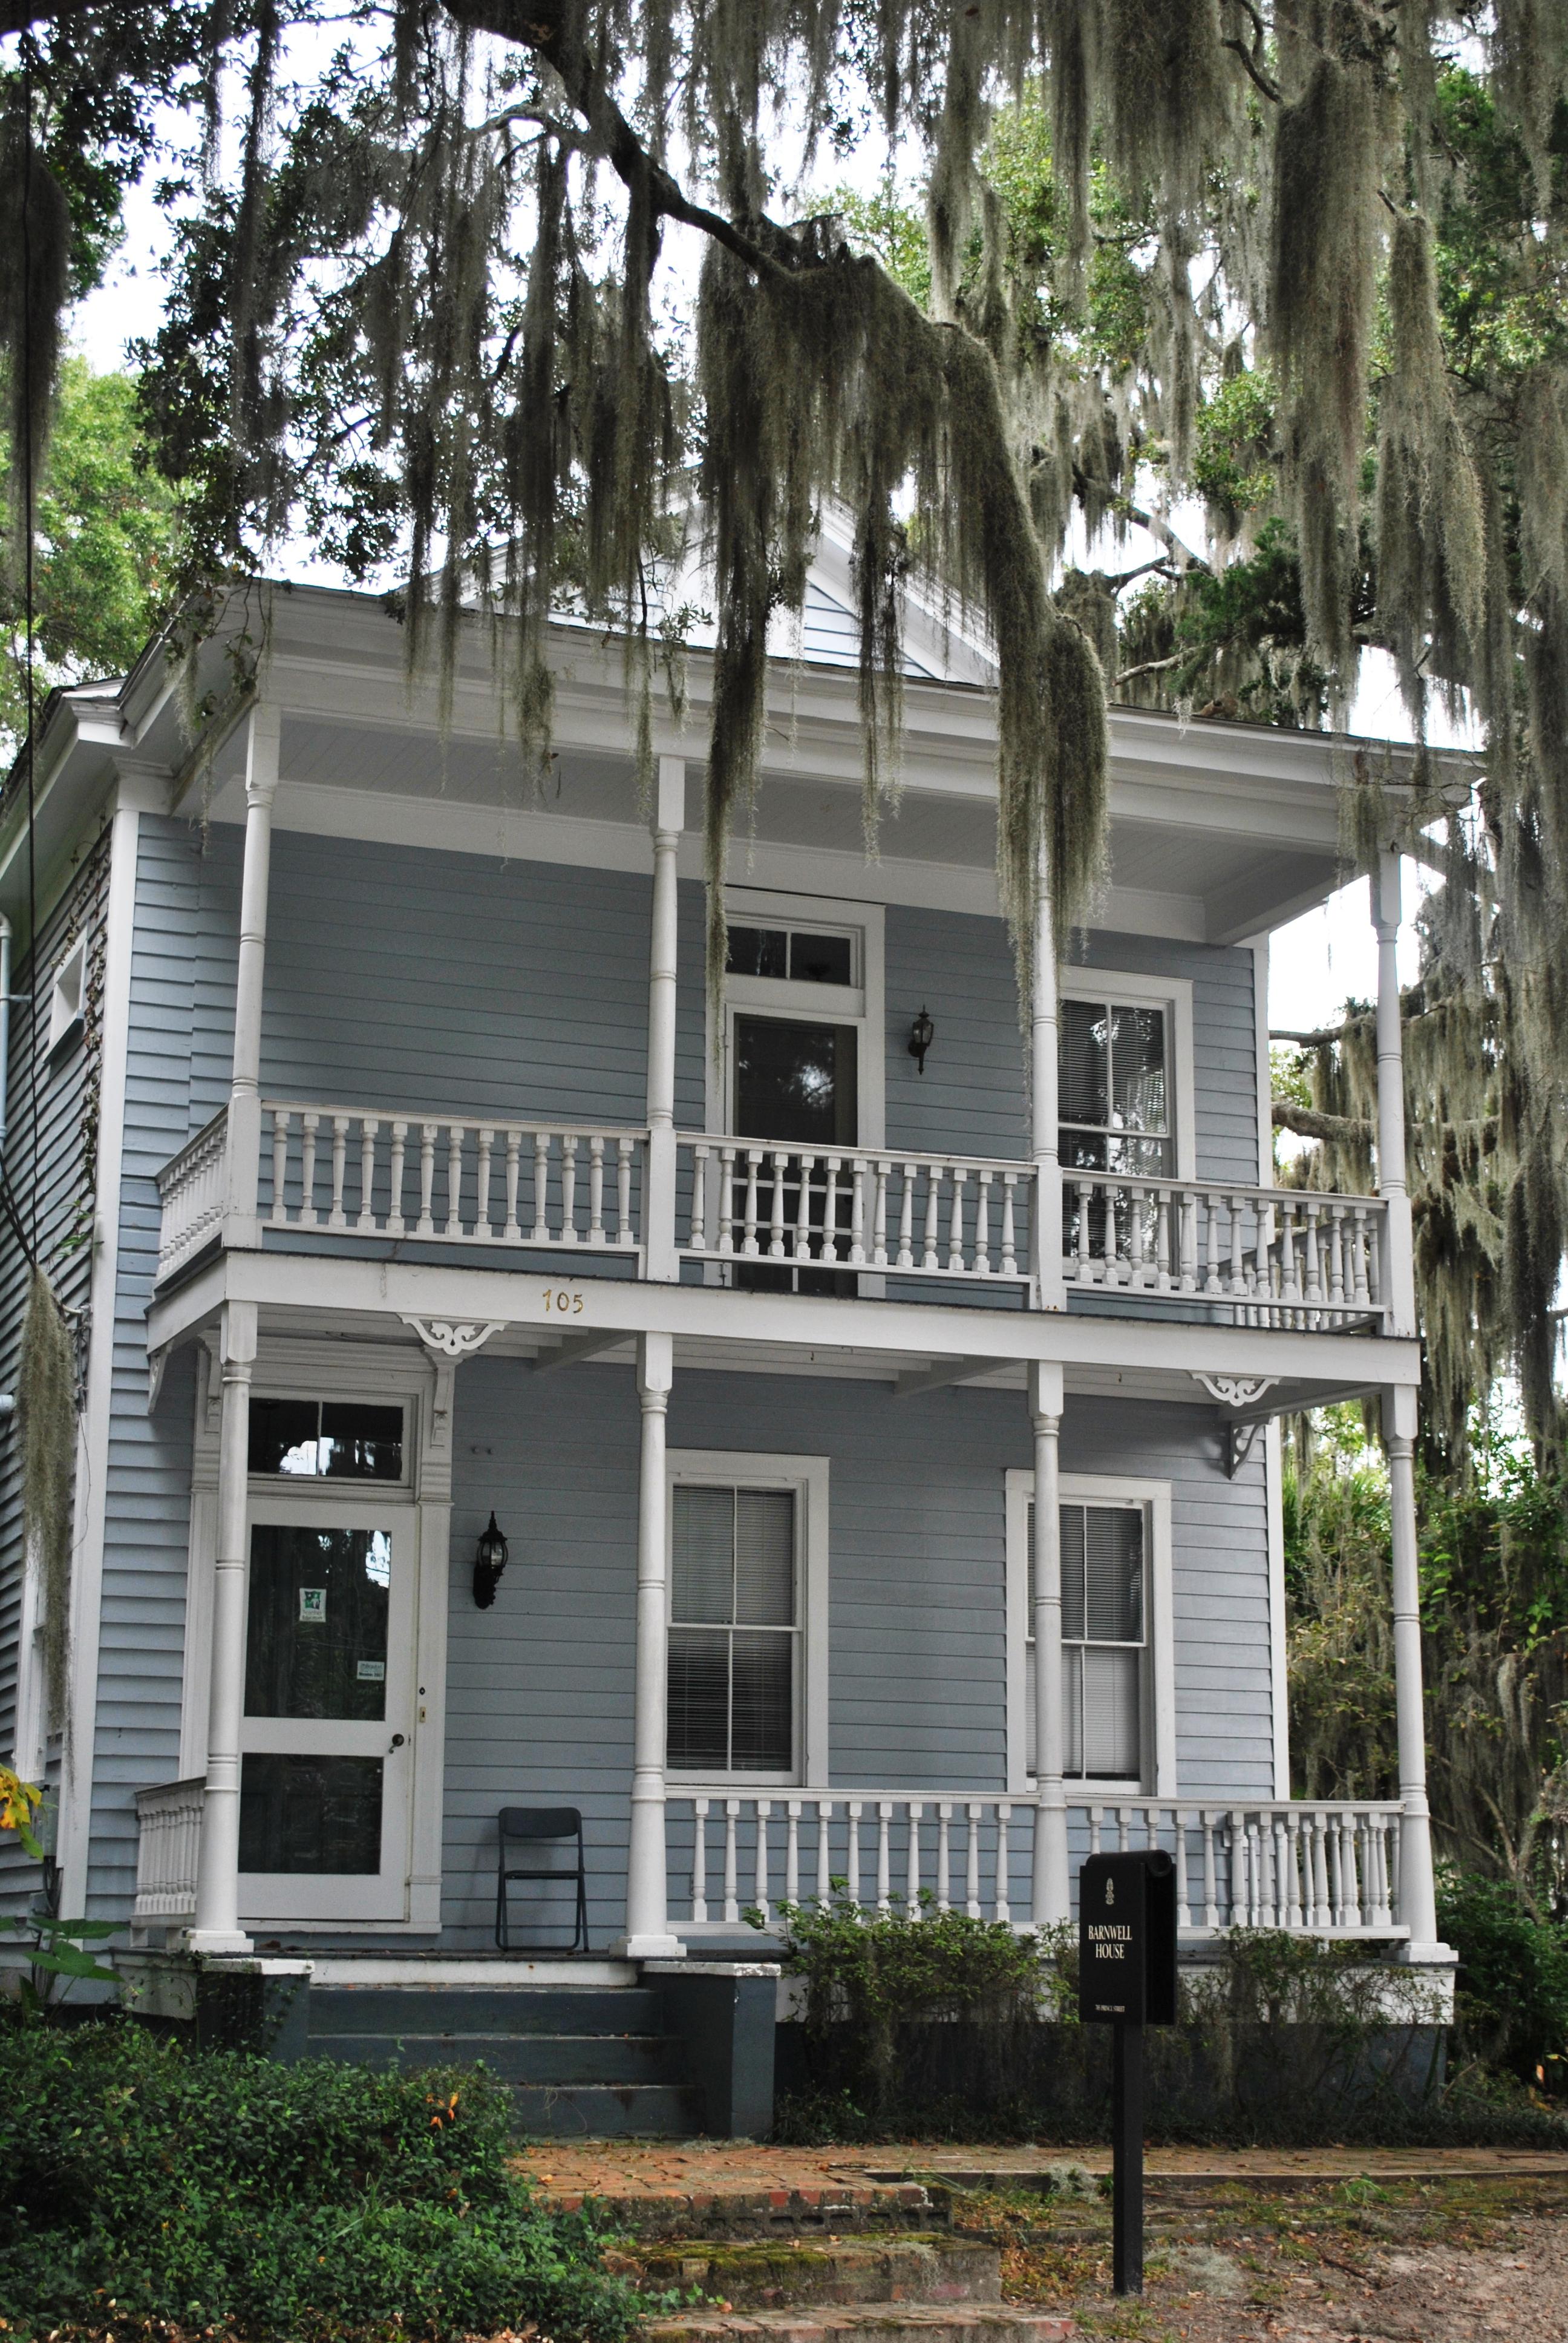 File:Barnwell House, 705 Prince Street.jpg